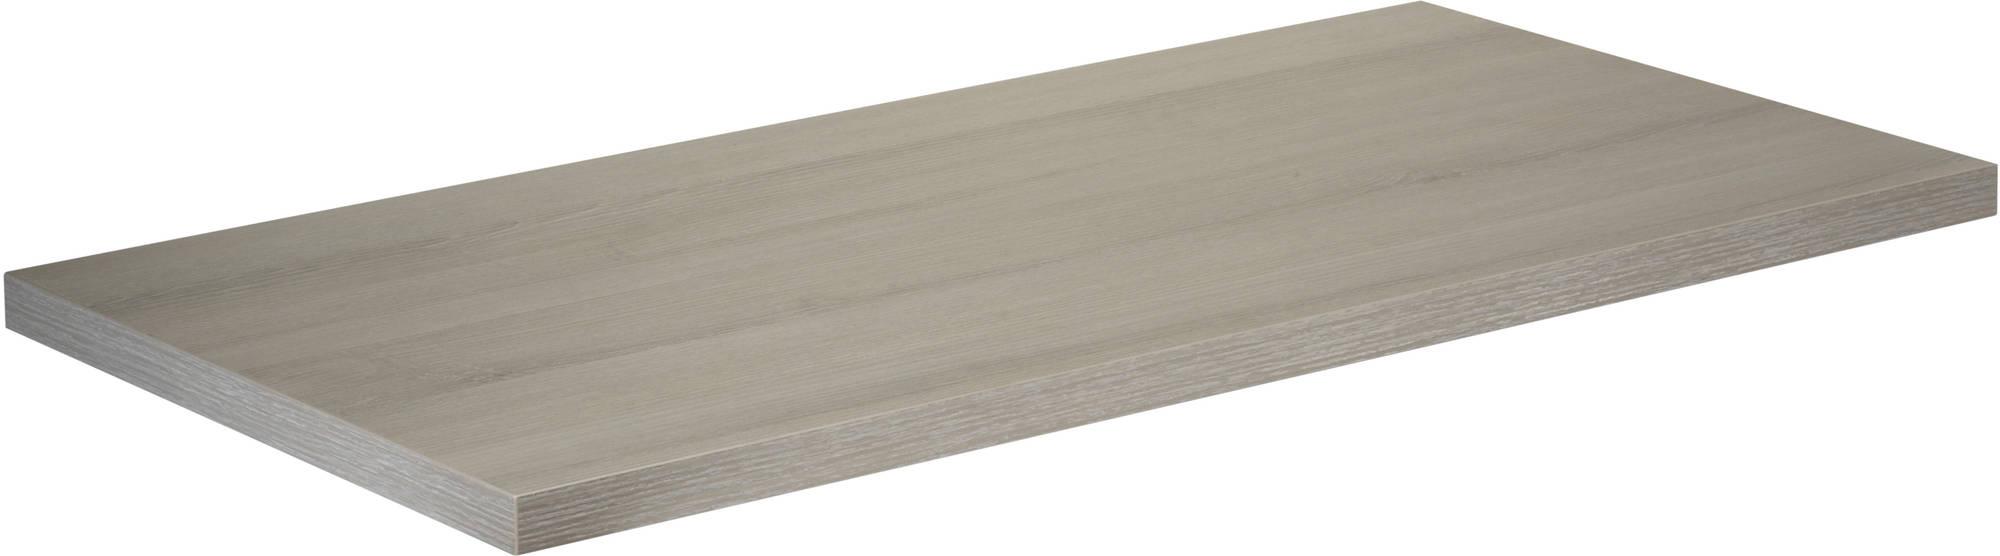 Saniselect Socan Wastafelblad 100x51,5cm Litho Grijs